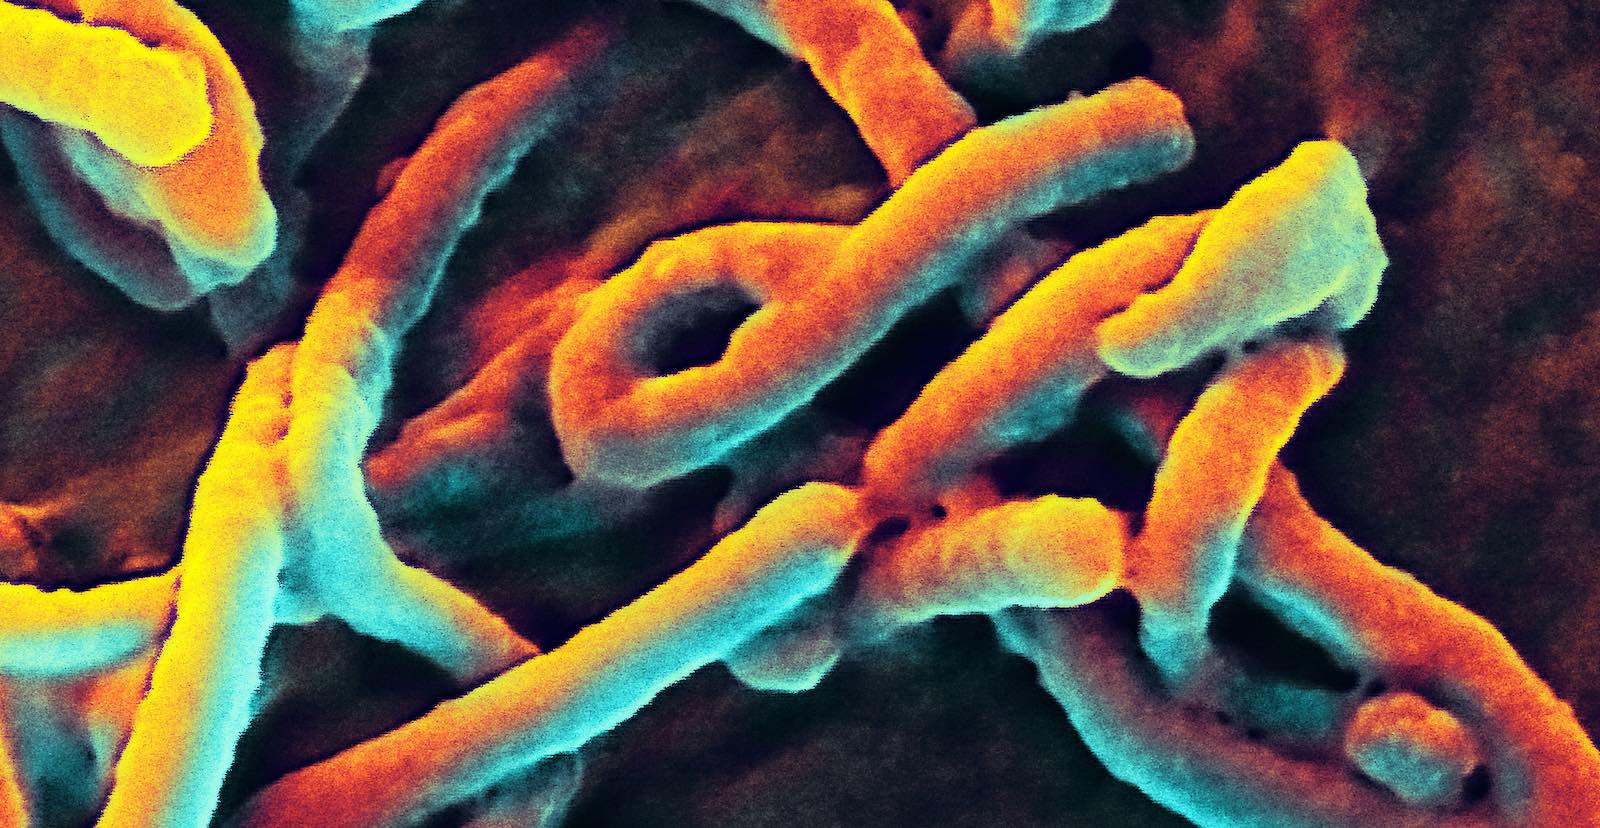 Scanning of an electron micrograph of Ebola virus budding (Photo: NIAID/Flickr)